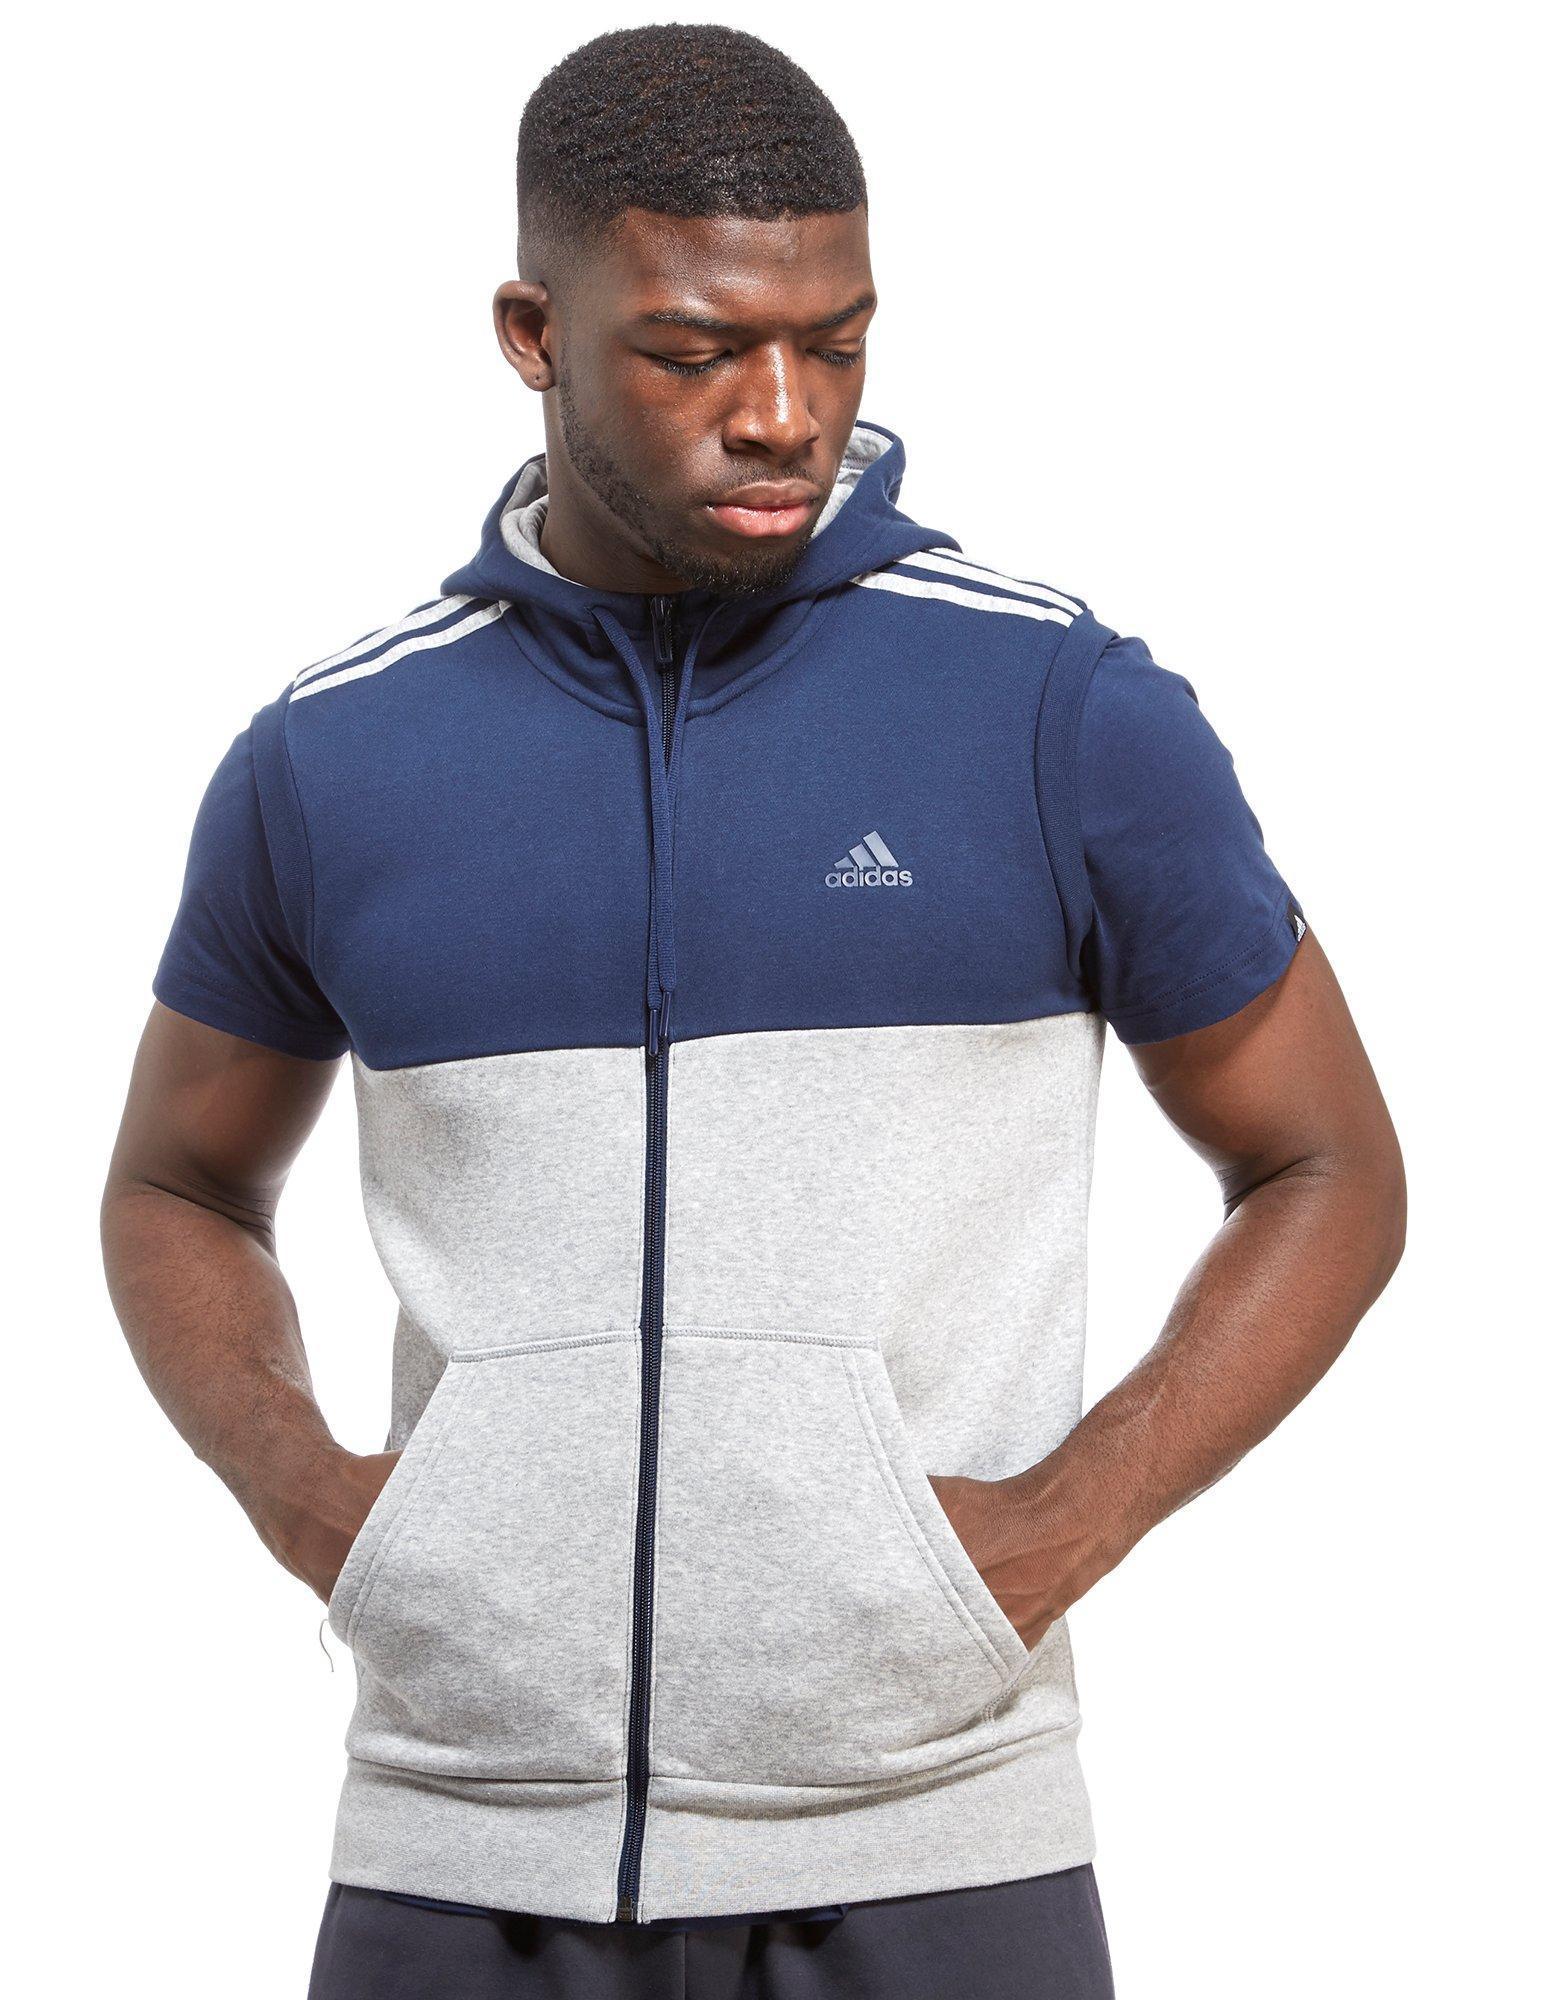 0c066b1214f616 adidas Linear Sleeveless Hoody in Blue for Men - Lyst